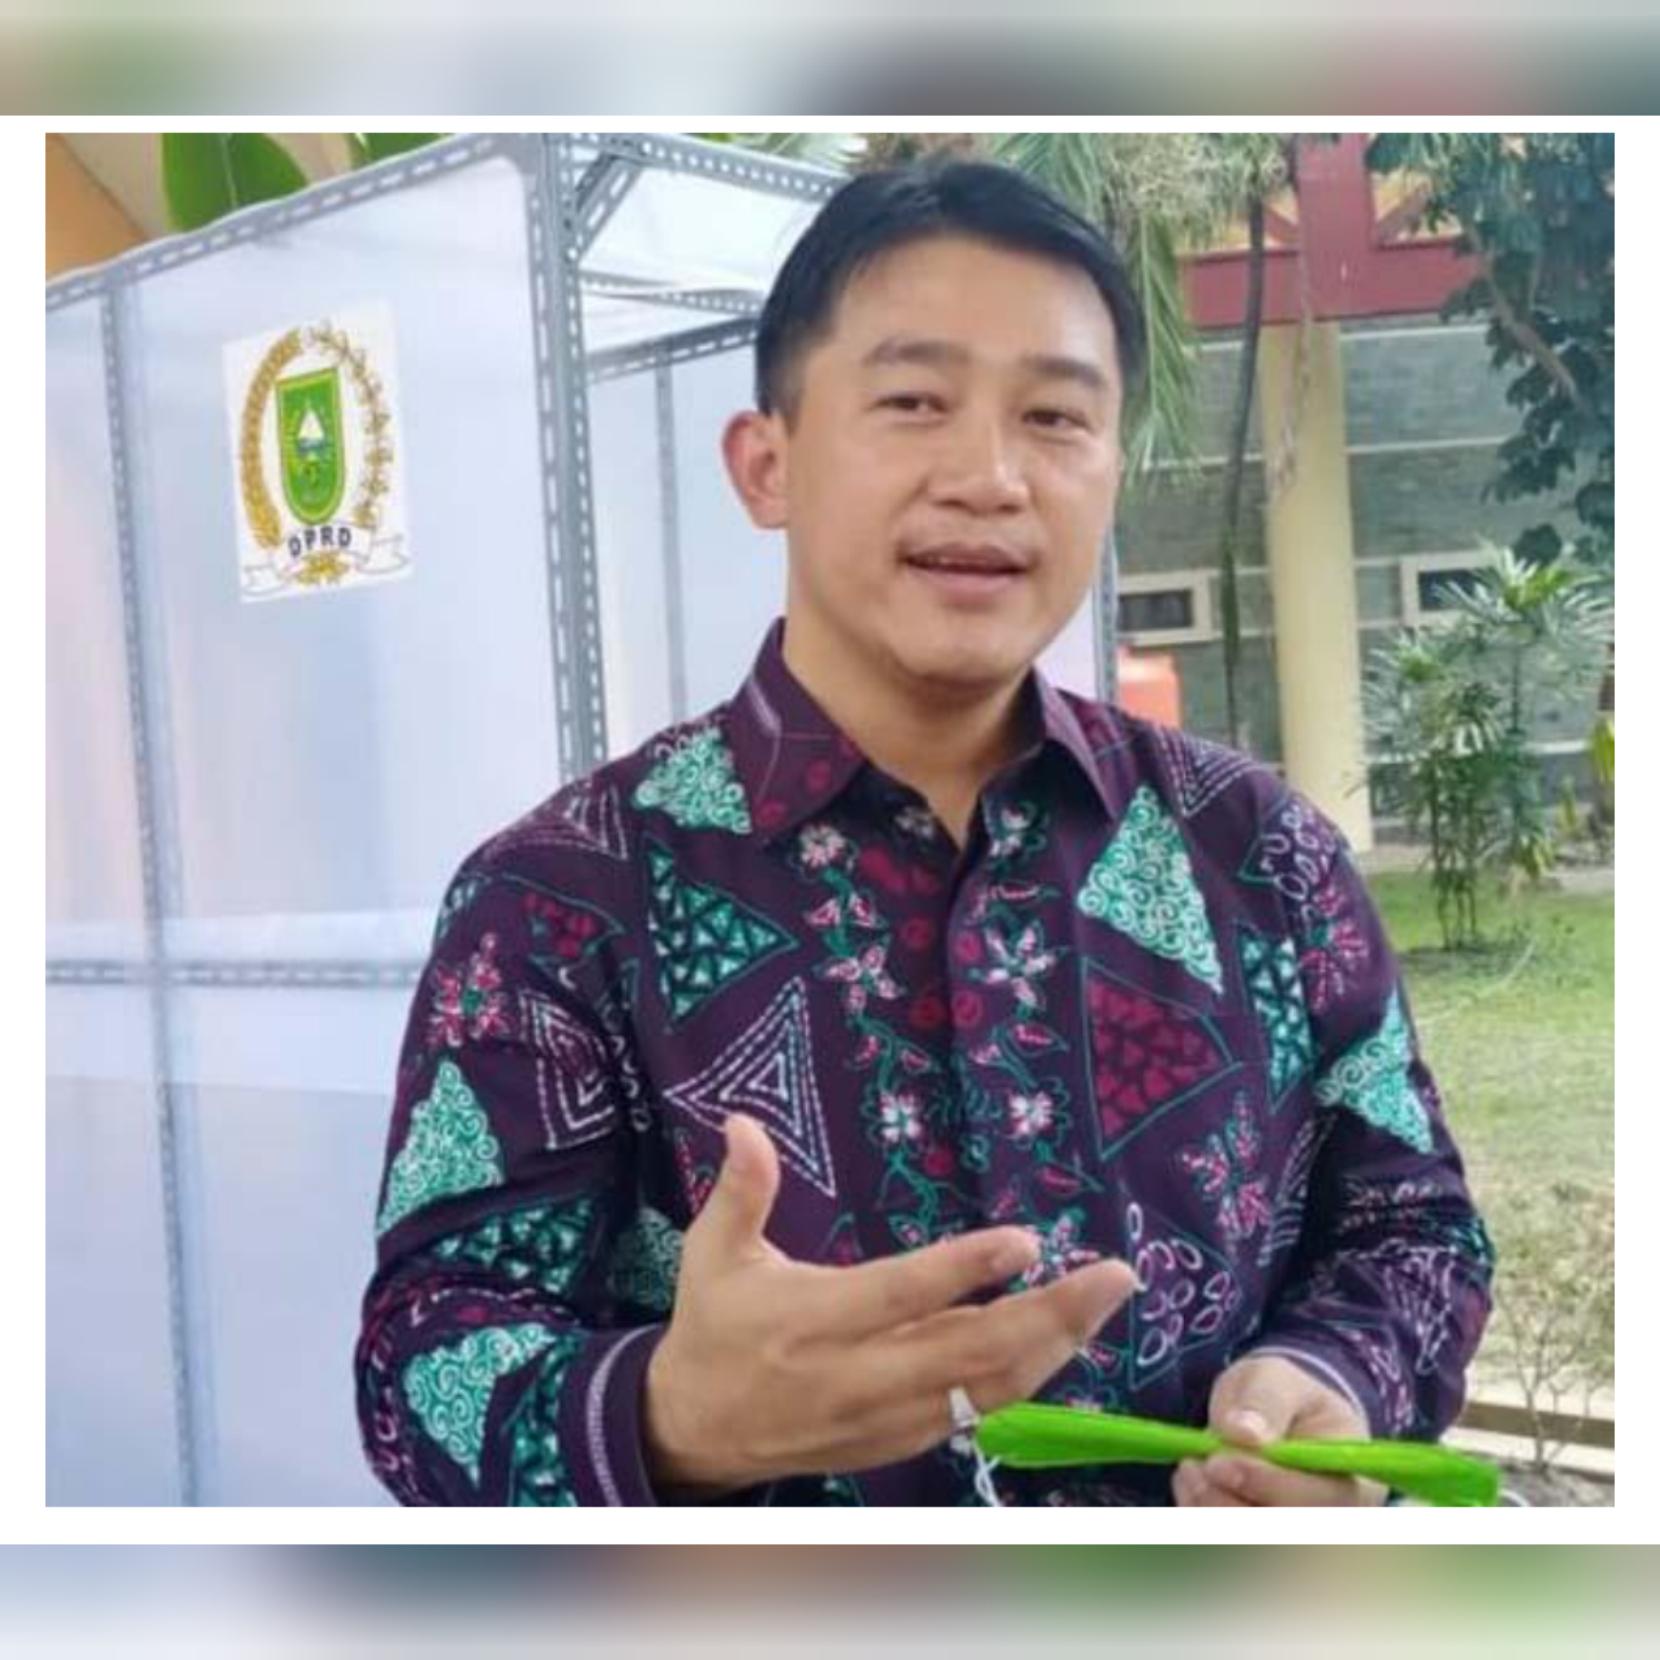 Hardianto Nakhodai DPRD Riau, Tiga Pimpinan Mundur Ikut Pilkada</a>